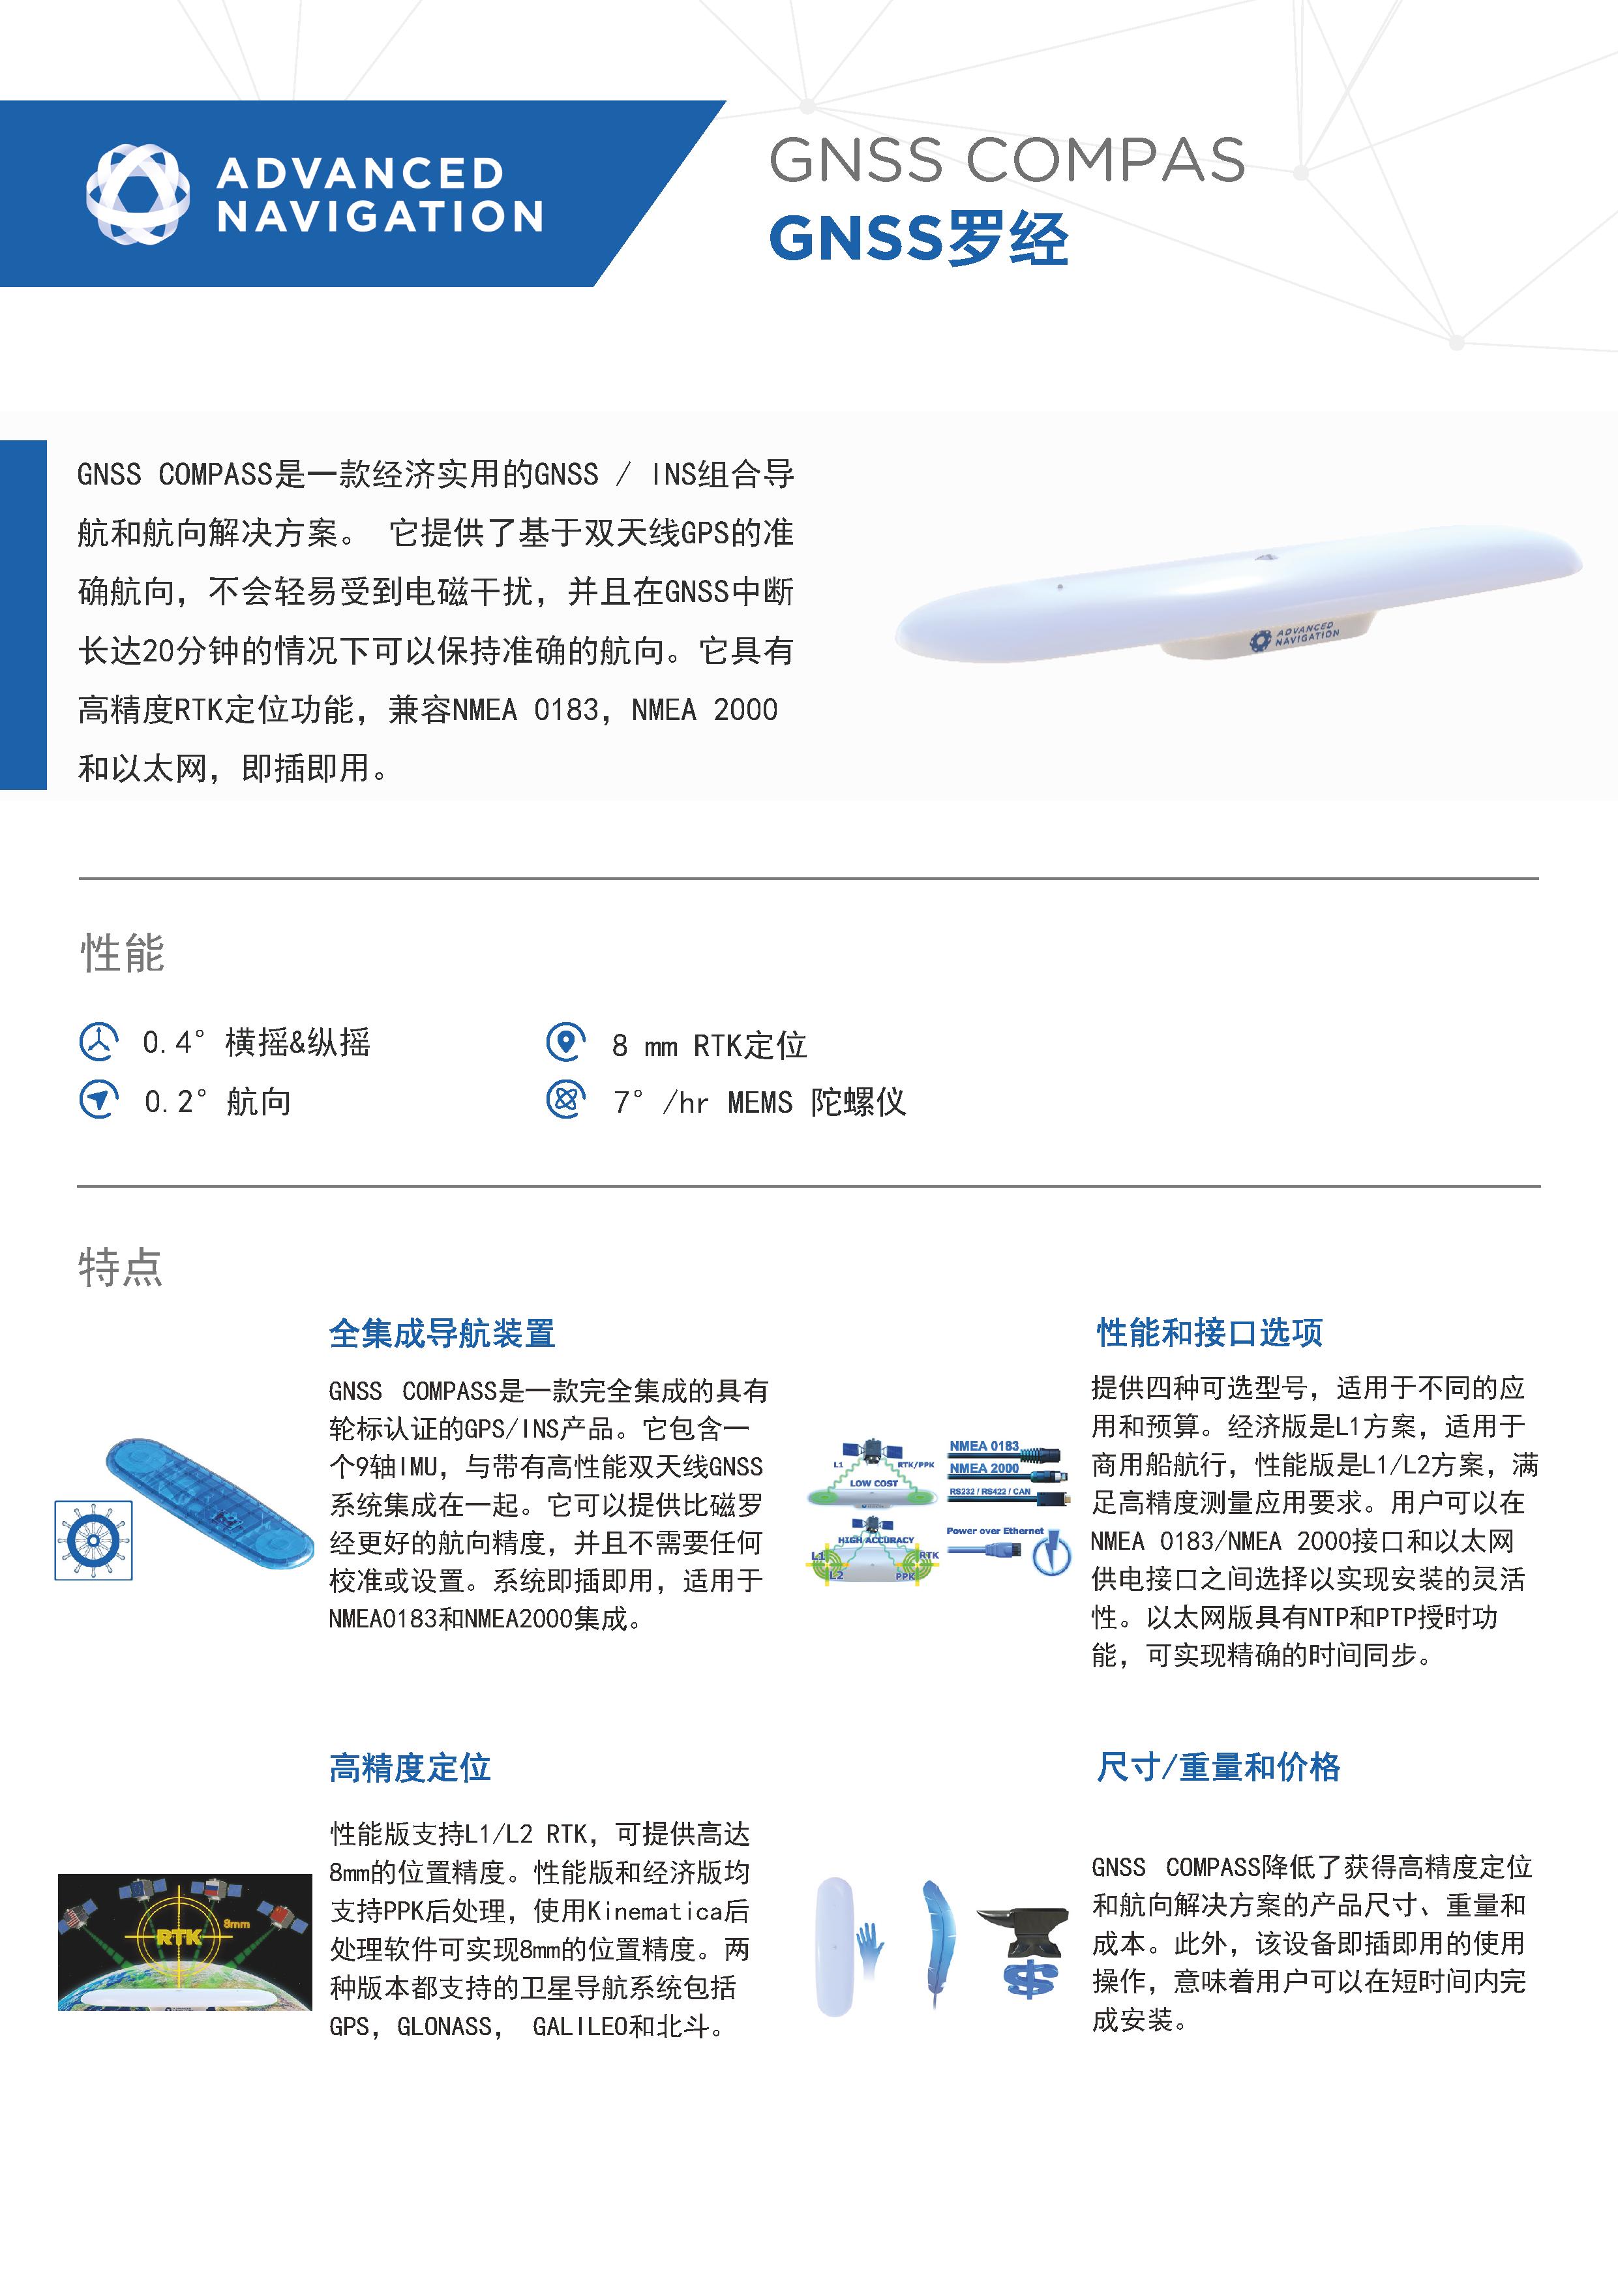 GNSS COMPASS GNSS/GPS罗经